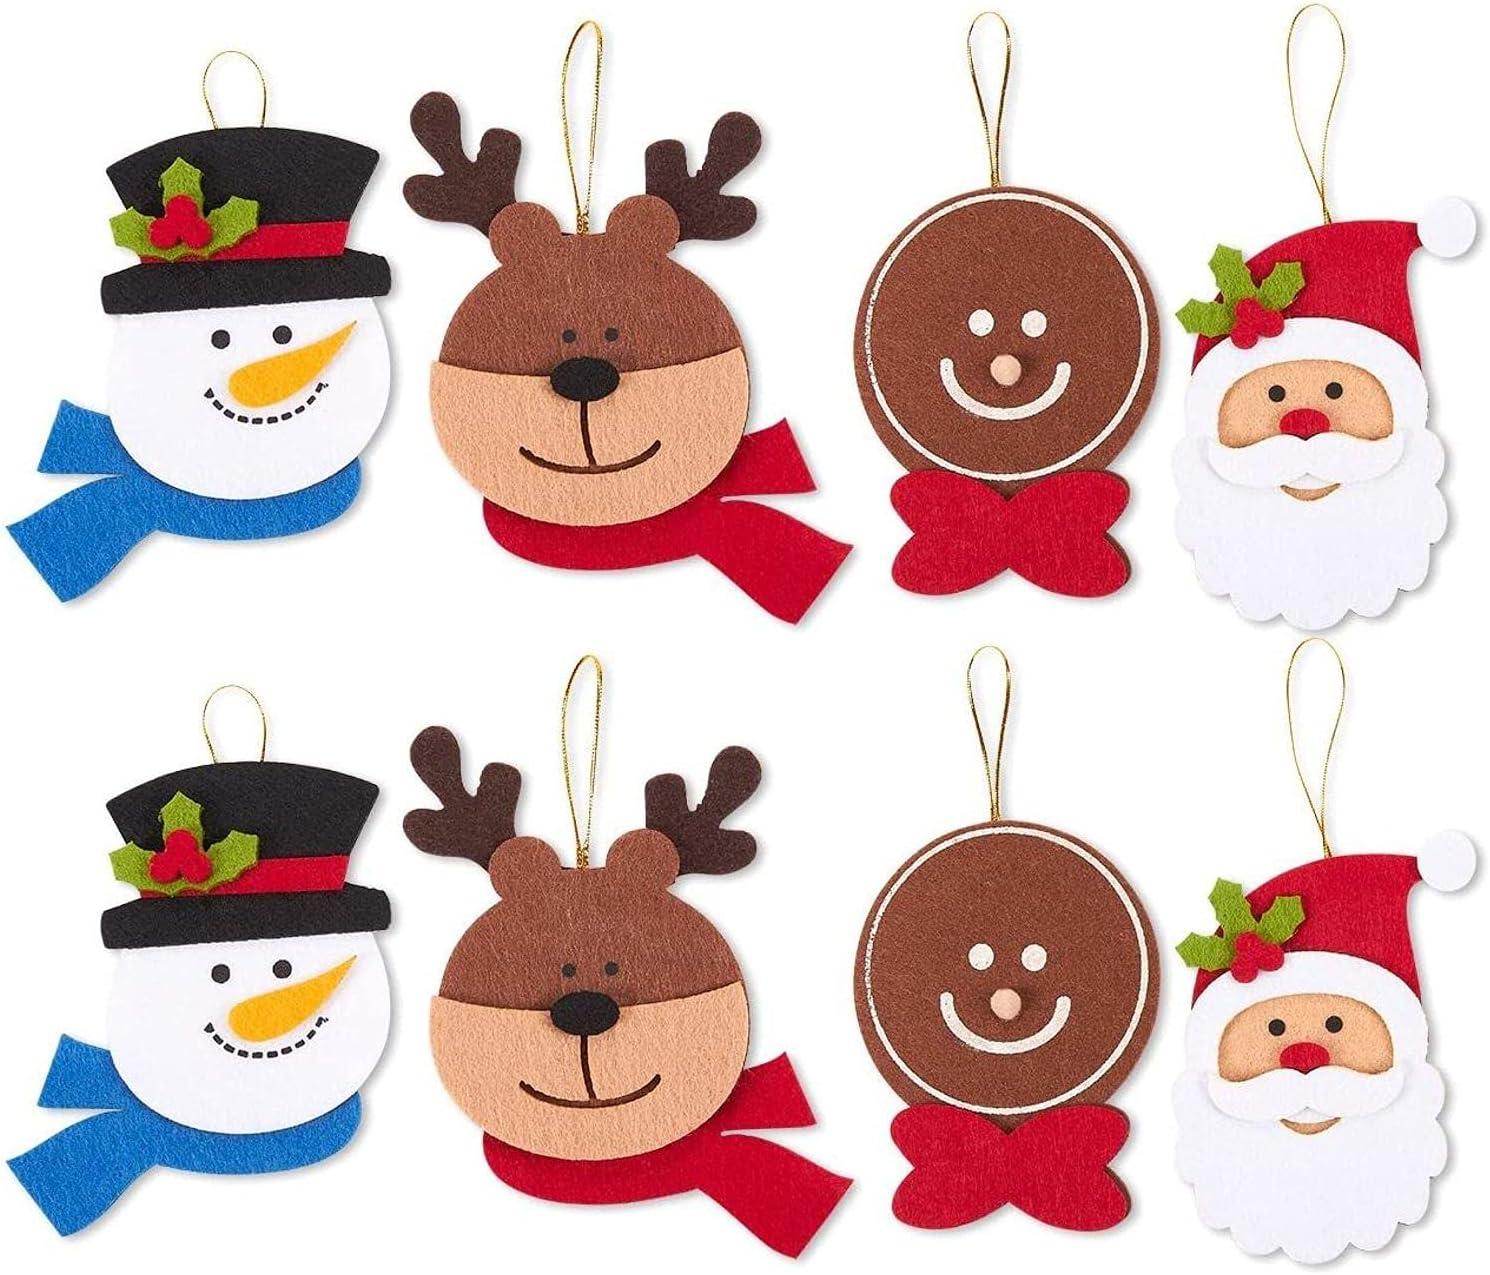 Felt Christmas Ornament Faces, Reindeer, Santa Claus, Gingerbread Man, Snowman (8 Pack)